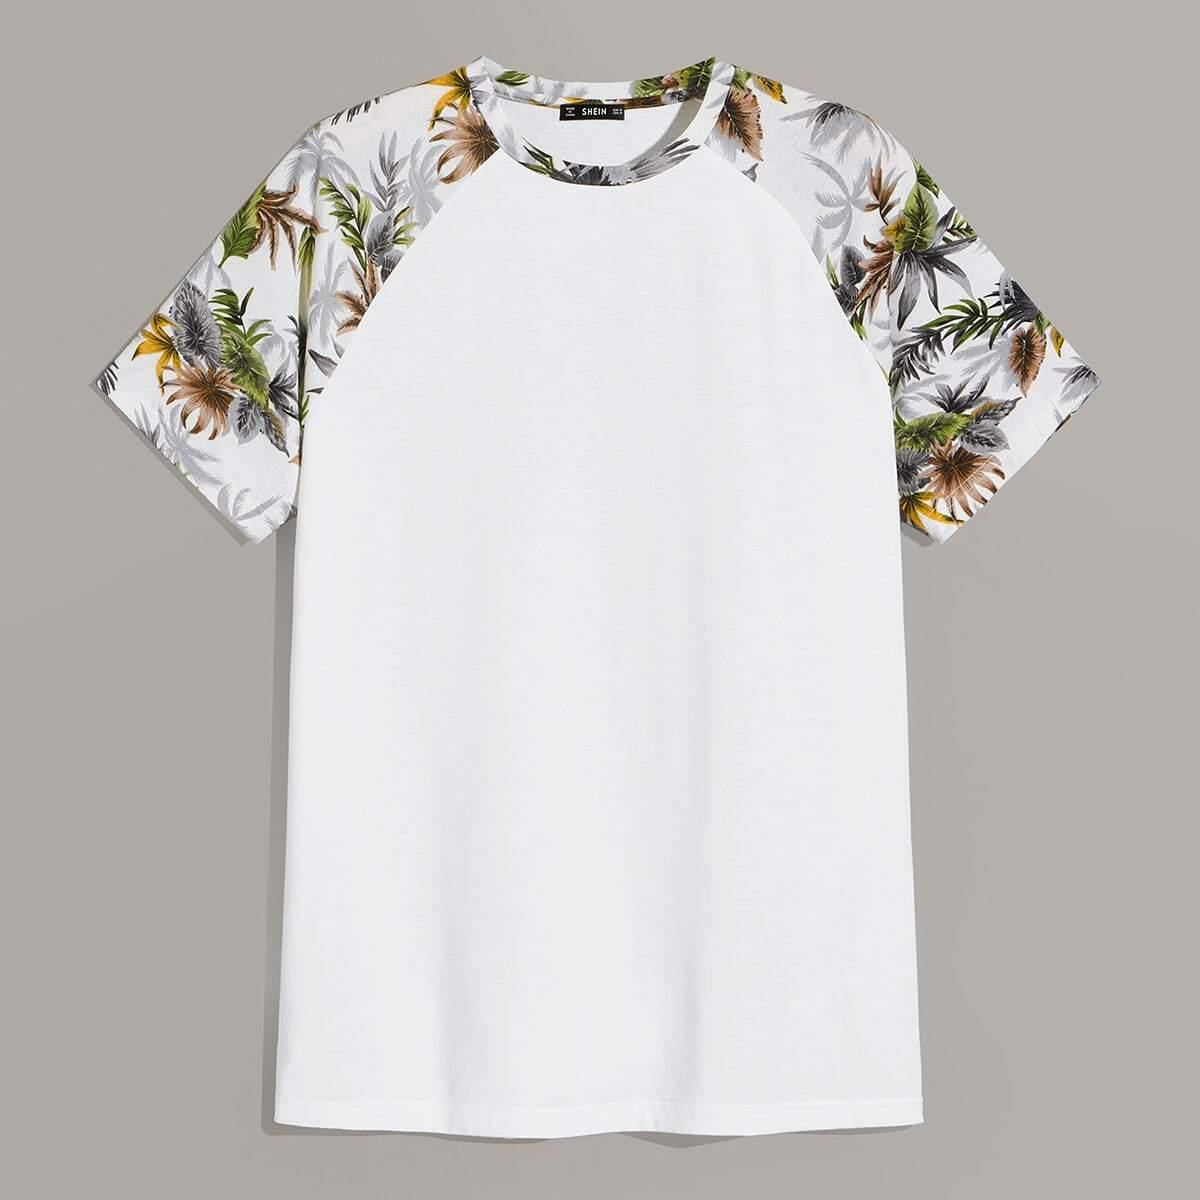 Wit Casual Tropisch Shirts mannen